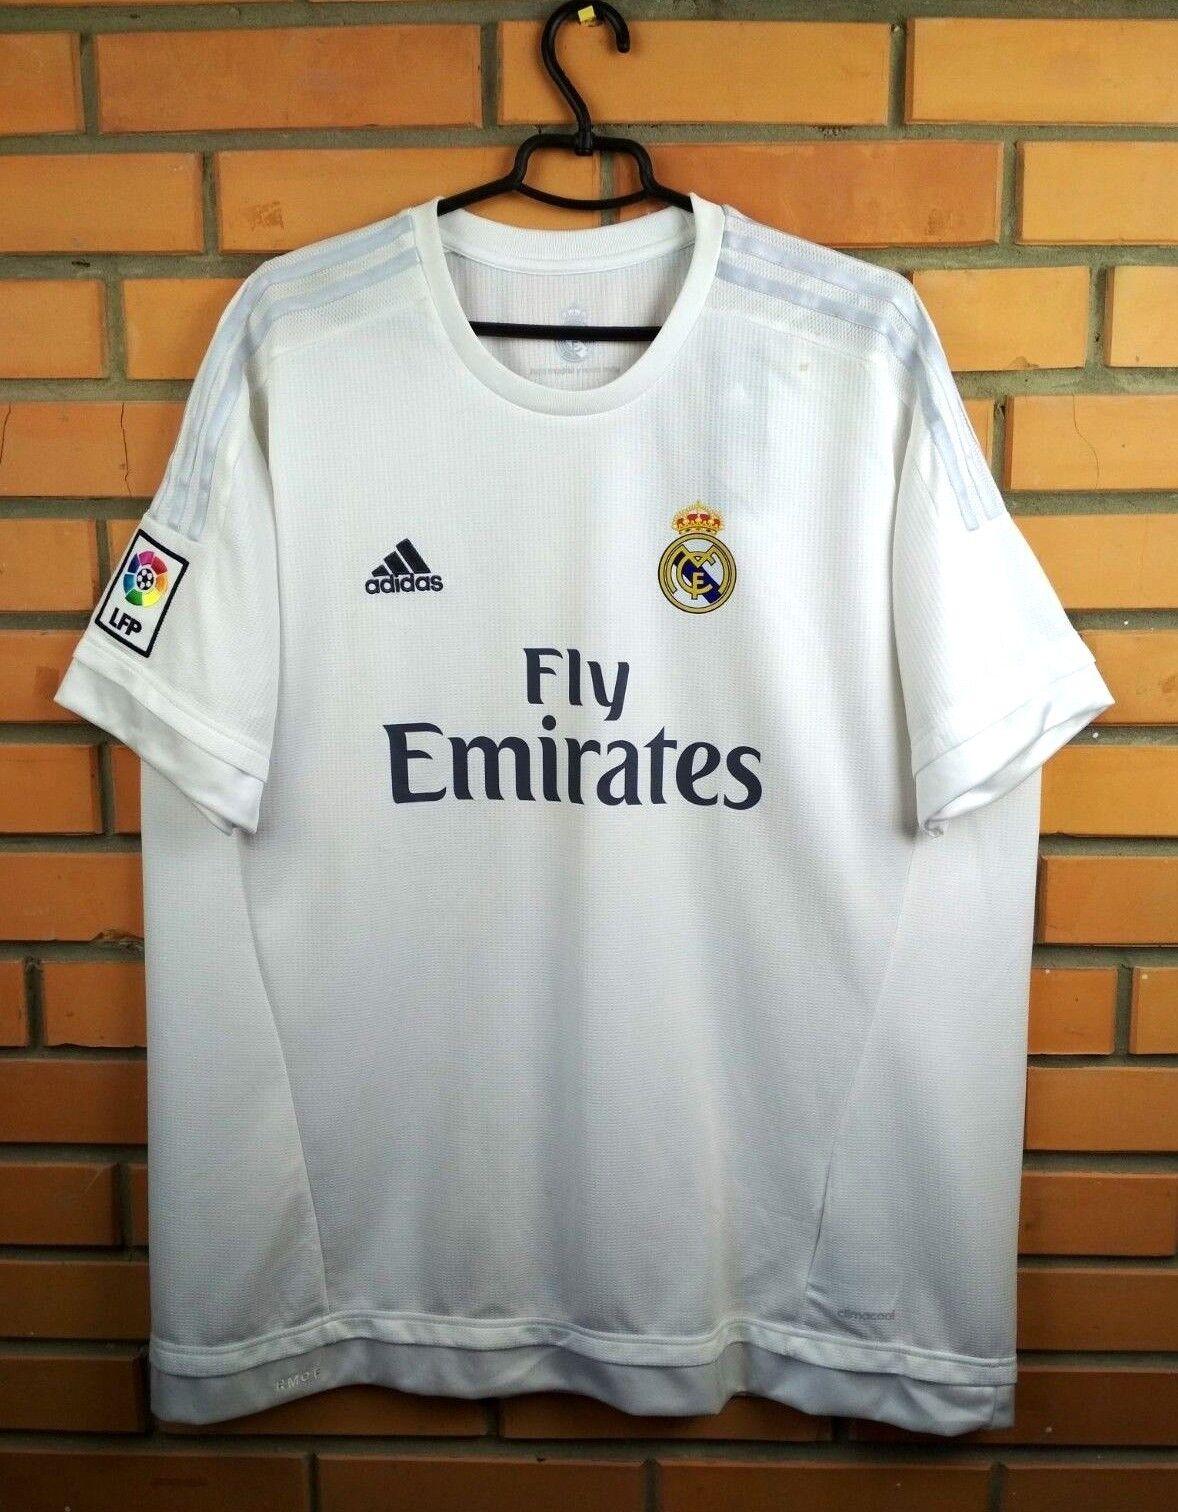 Real Madrid jersey 2XL 2015 2016 home shirt S12652 soccer football Adidas